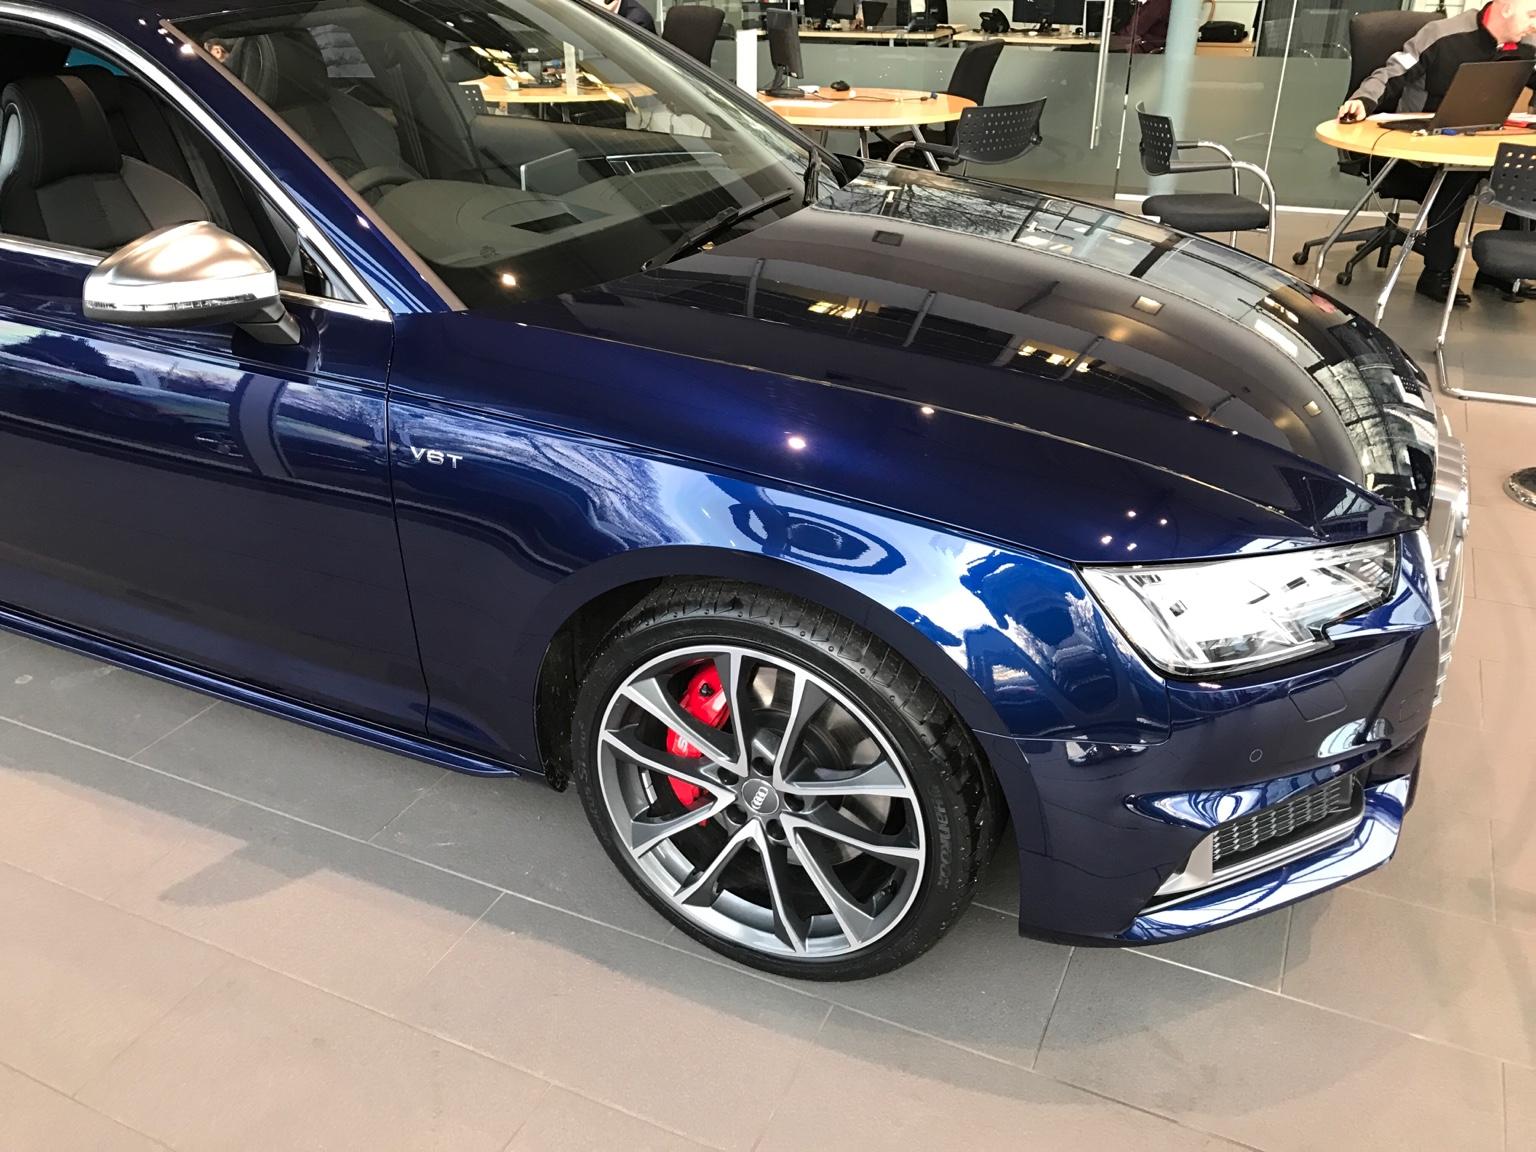 New Audi A5 S5 Picture Thread Audi Sport Net